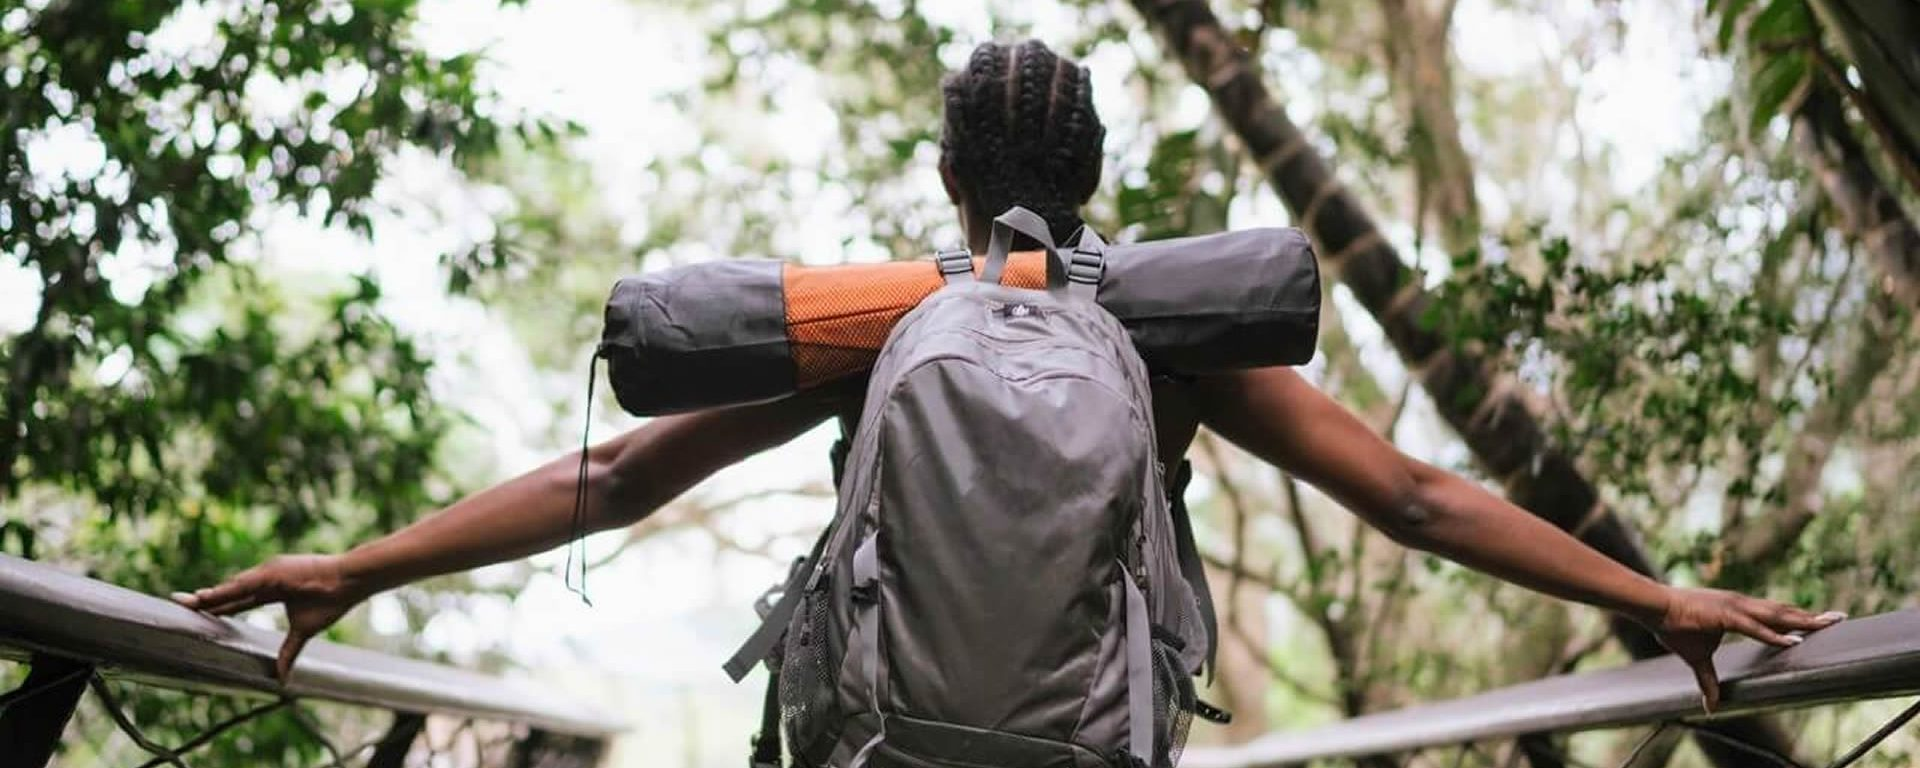 Idee regalo trekking